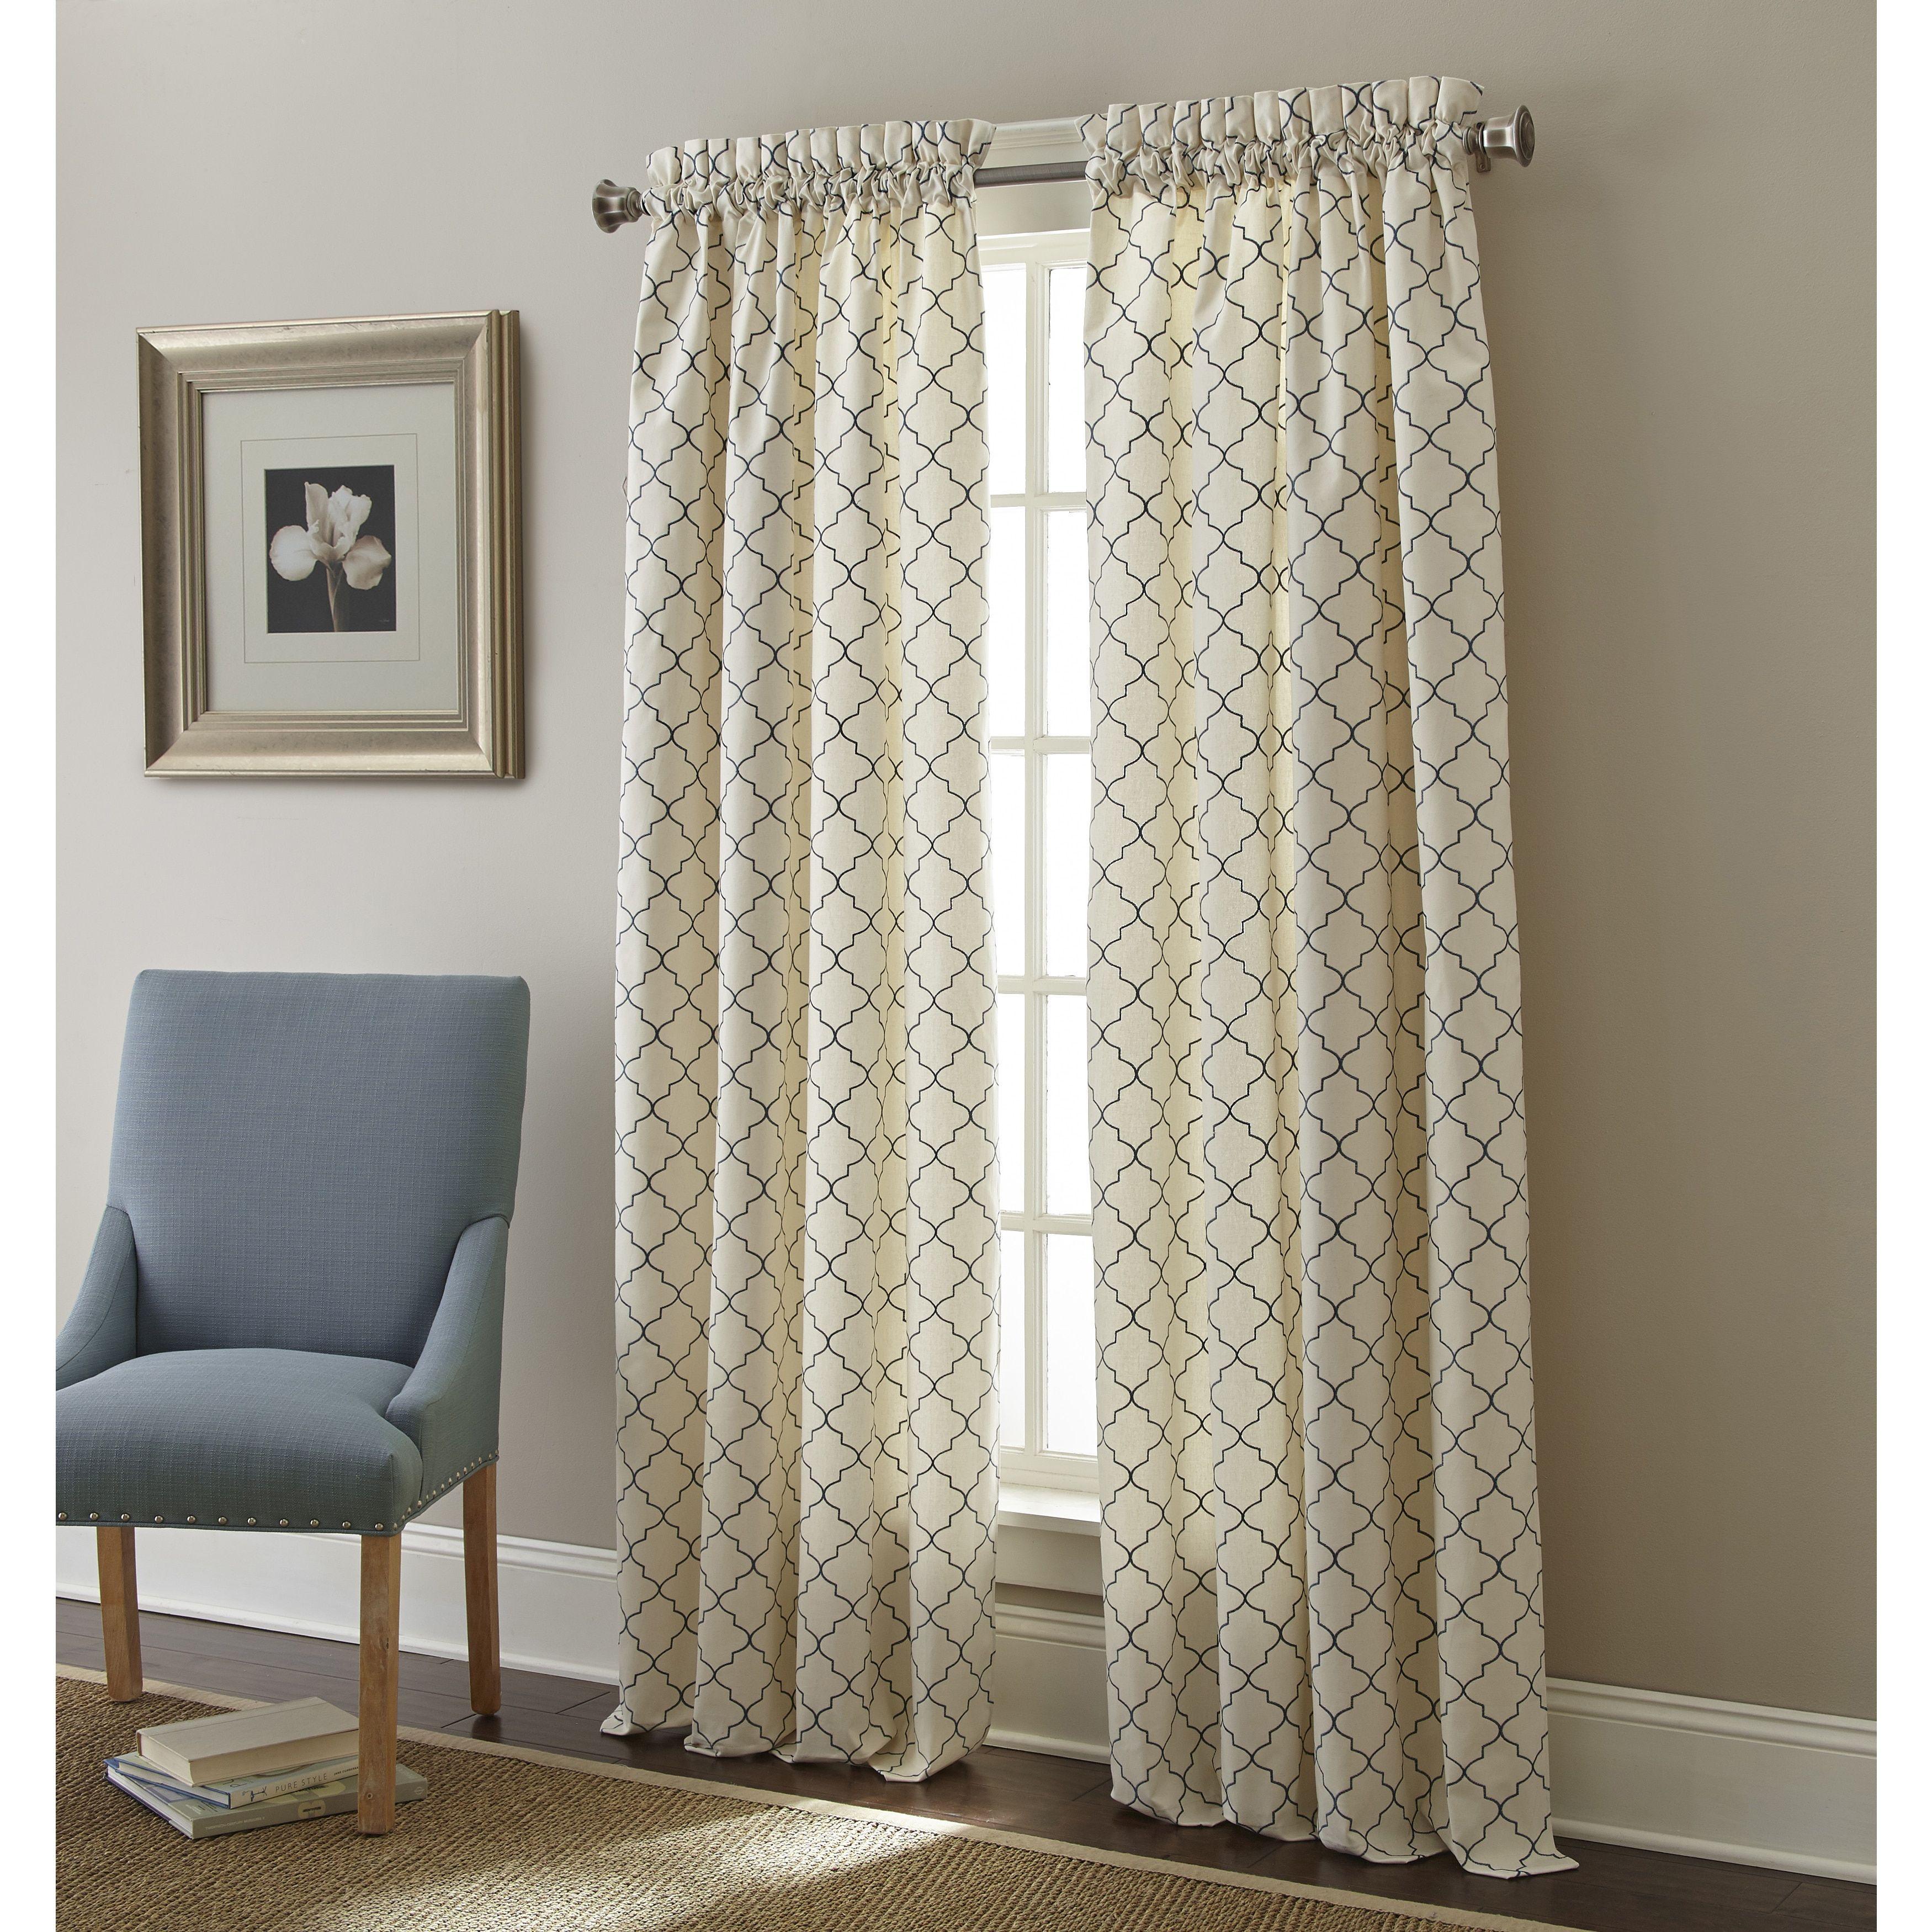 Sherry Kline Westbury Embroidered Rod Pocket 84 Inch Curtain Panel